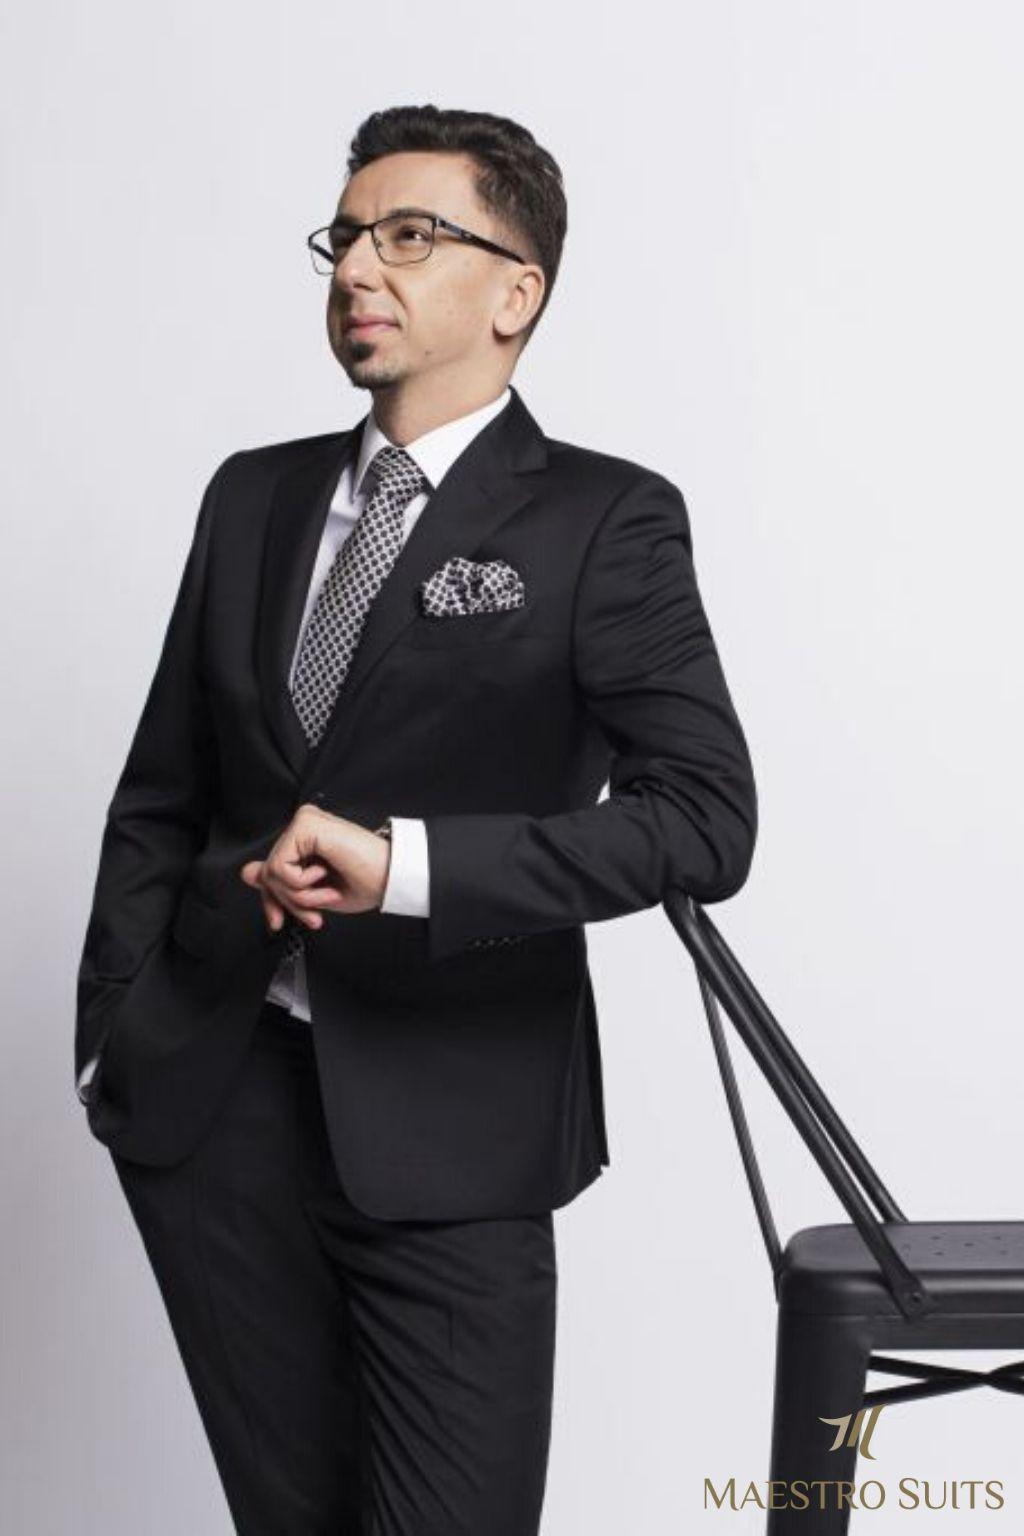 zvonko_komsic_maestro_suits (4)